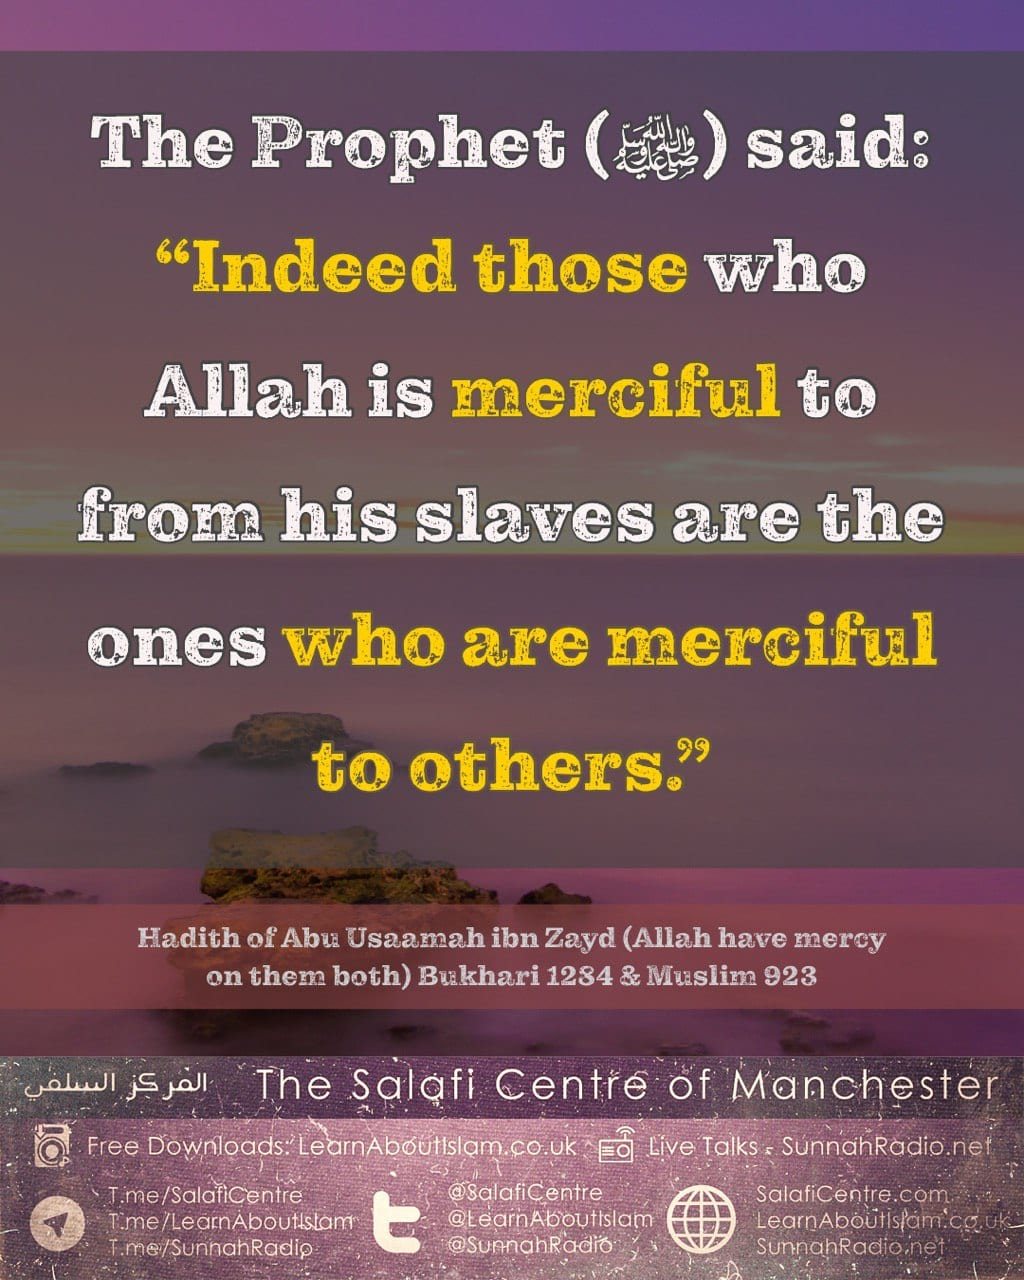 Tremendous Benefits of Gentleness for Your Hearts – Shaykh al-Uthaymeen